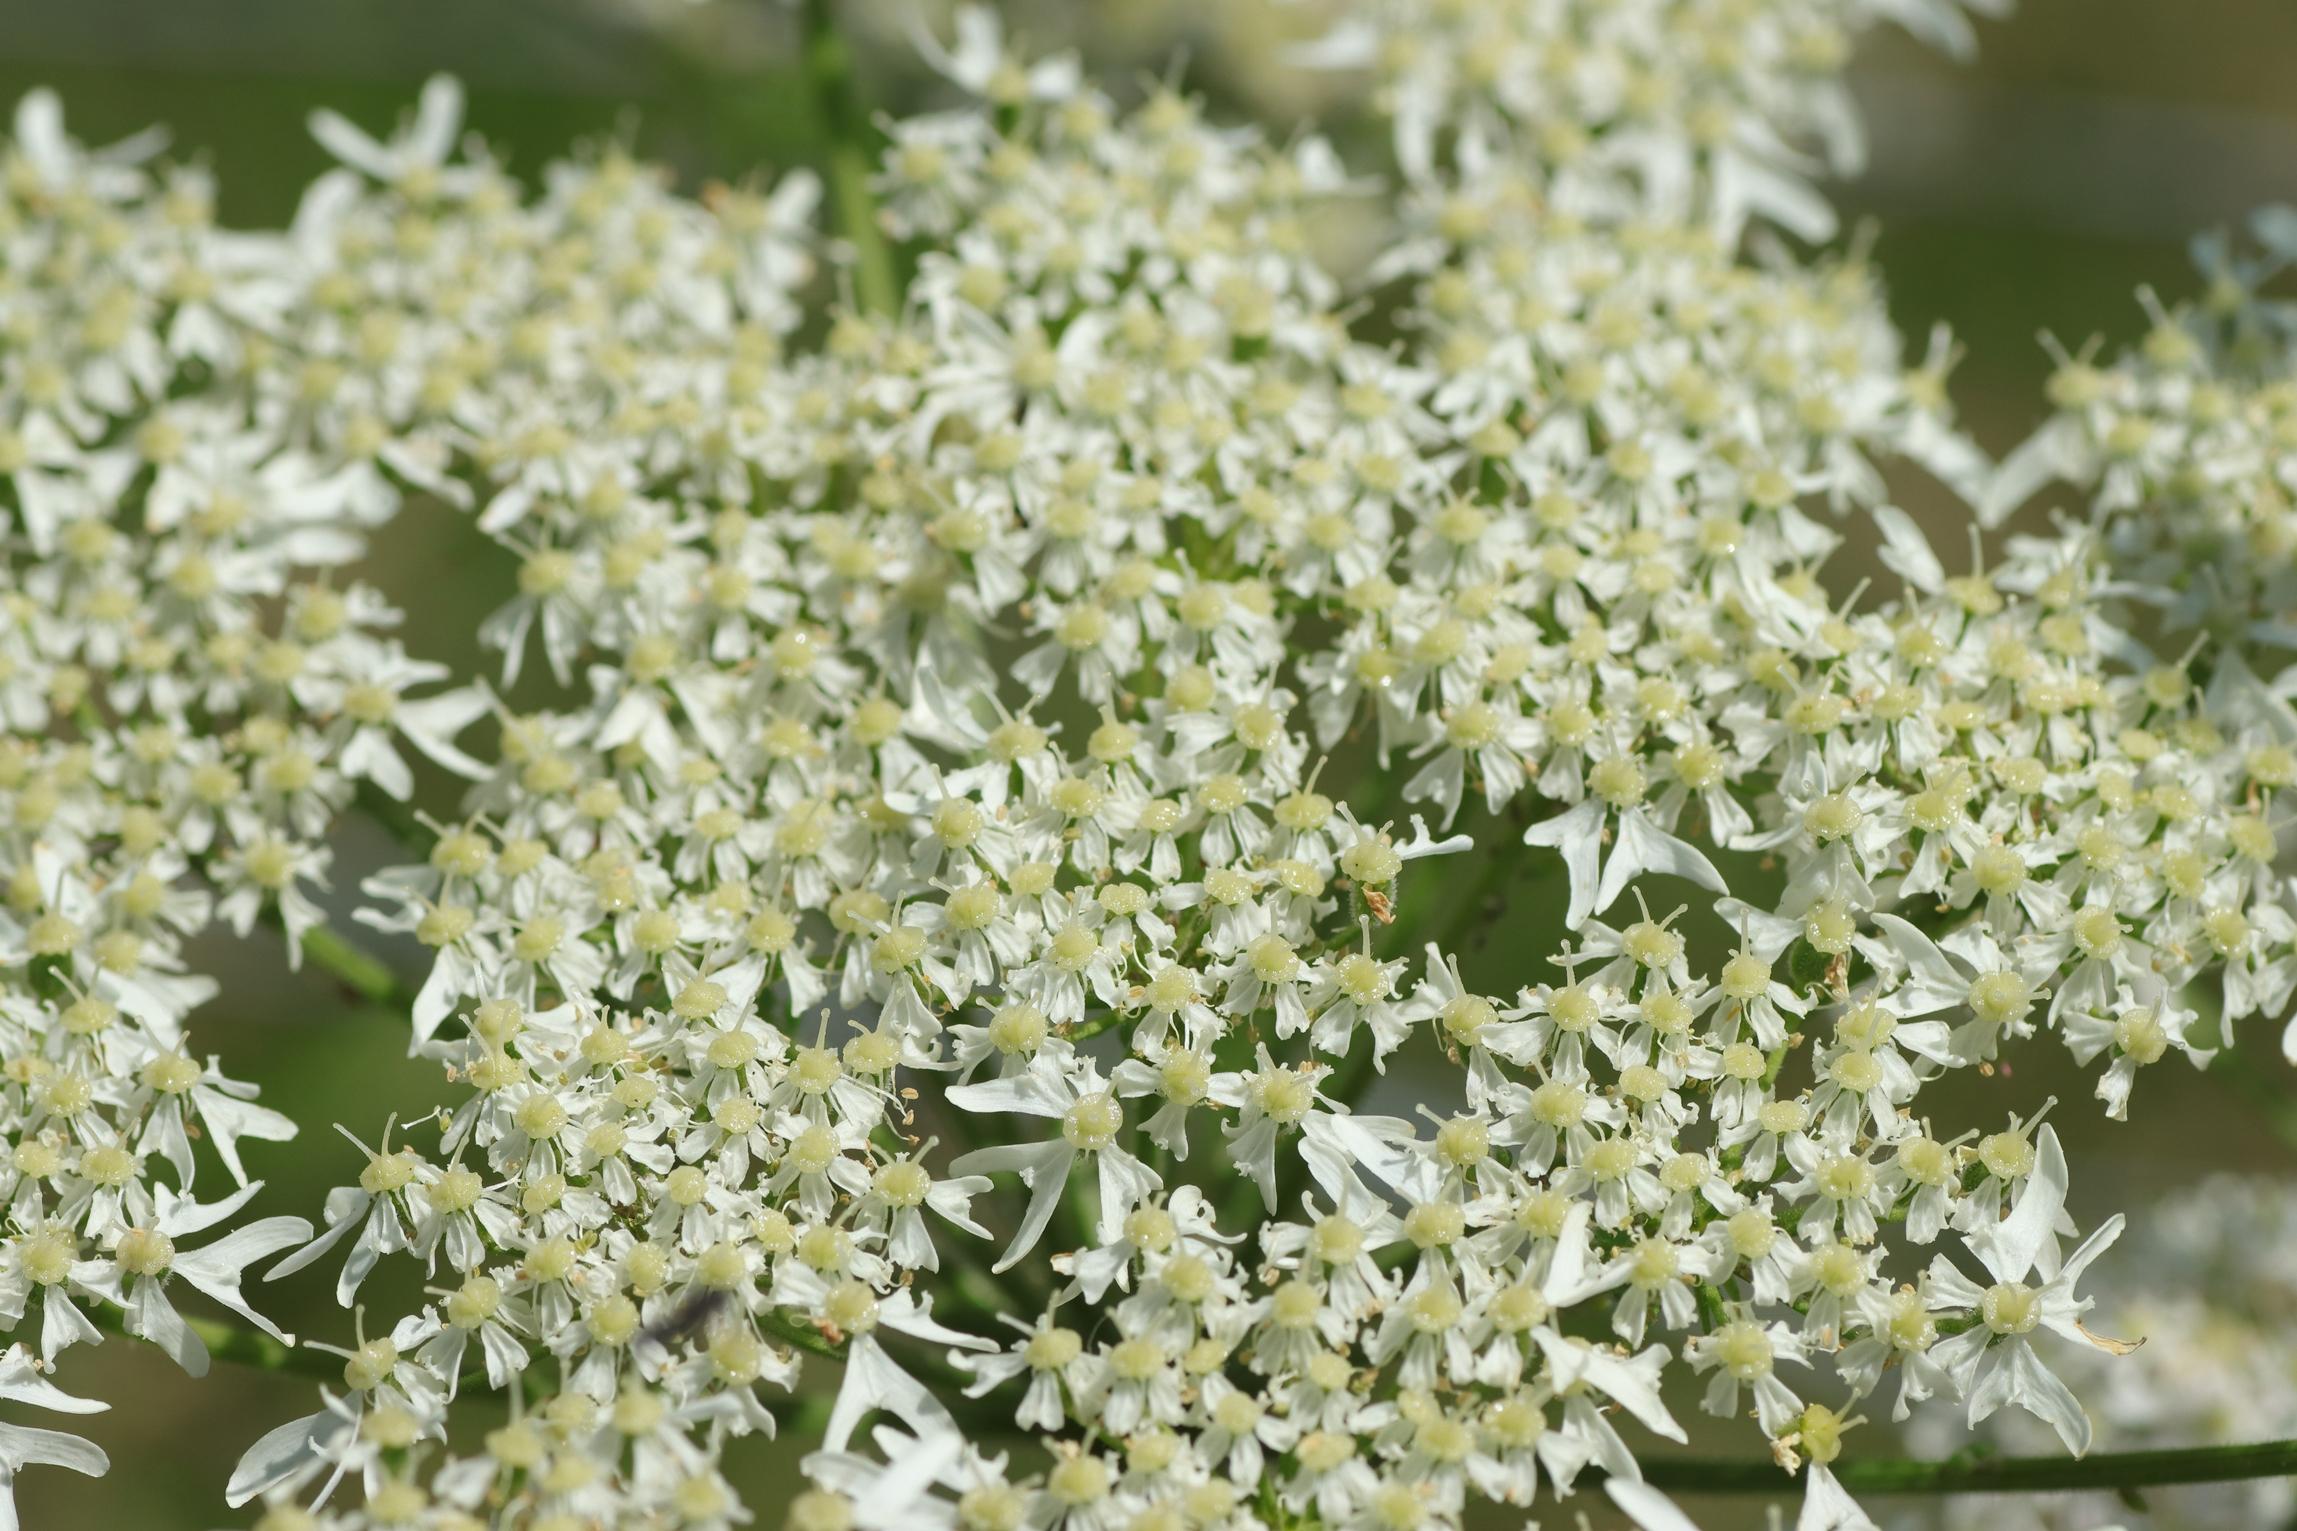 Wiesen-Bärenklau - Blüte